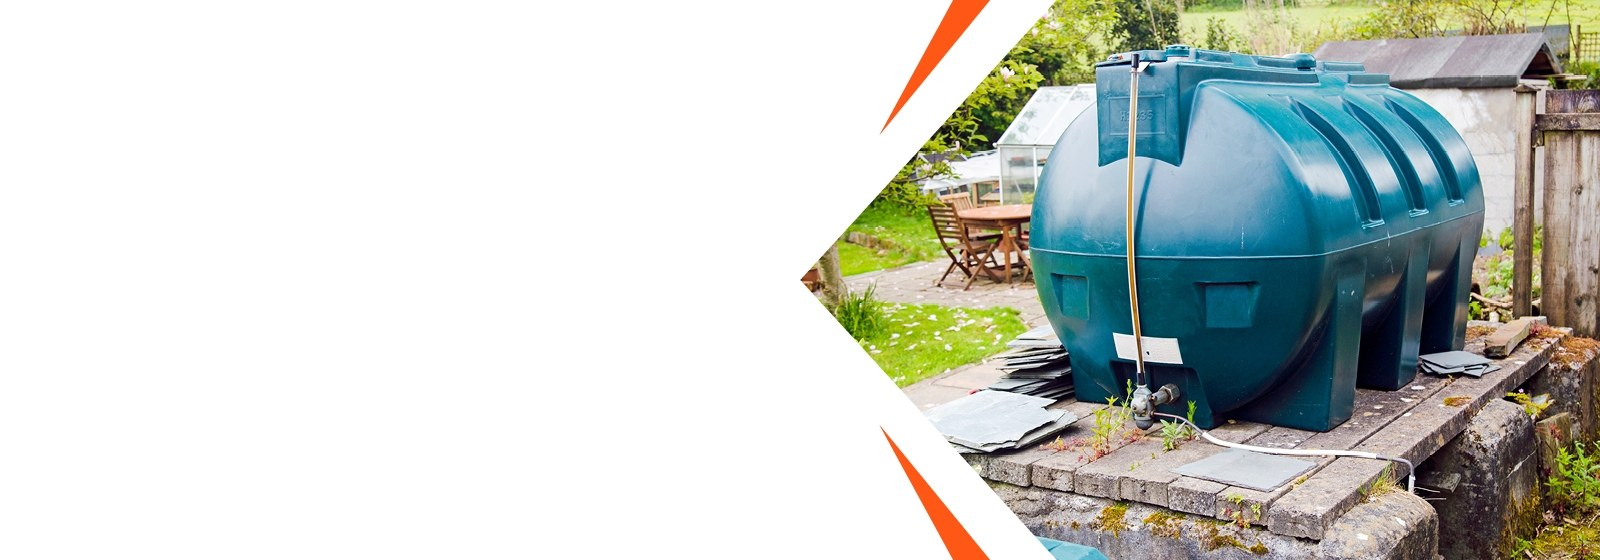 Hybrid air source heat pump for oil or LPG users